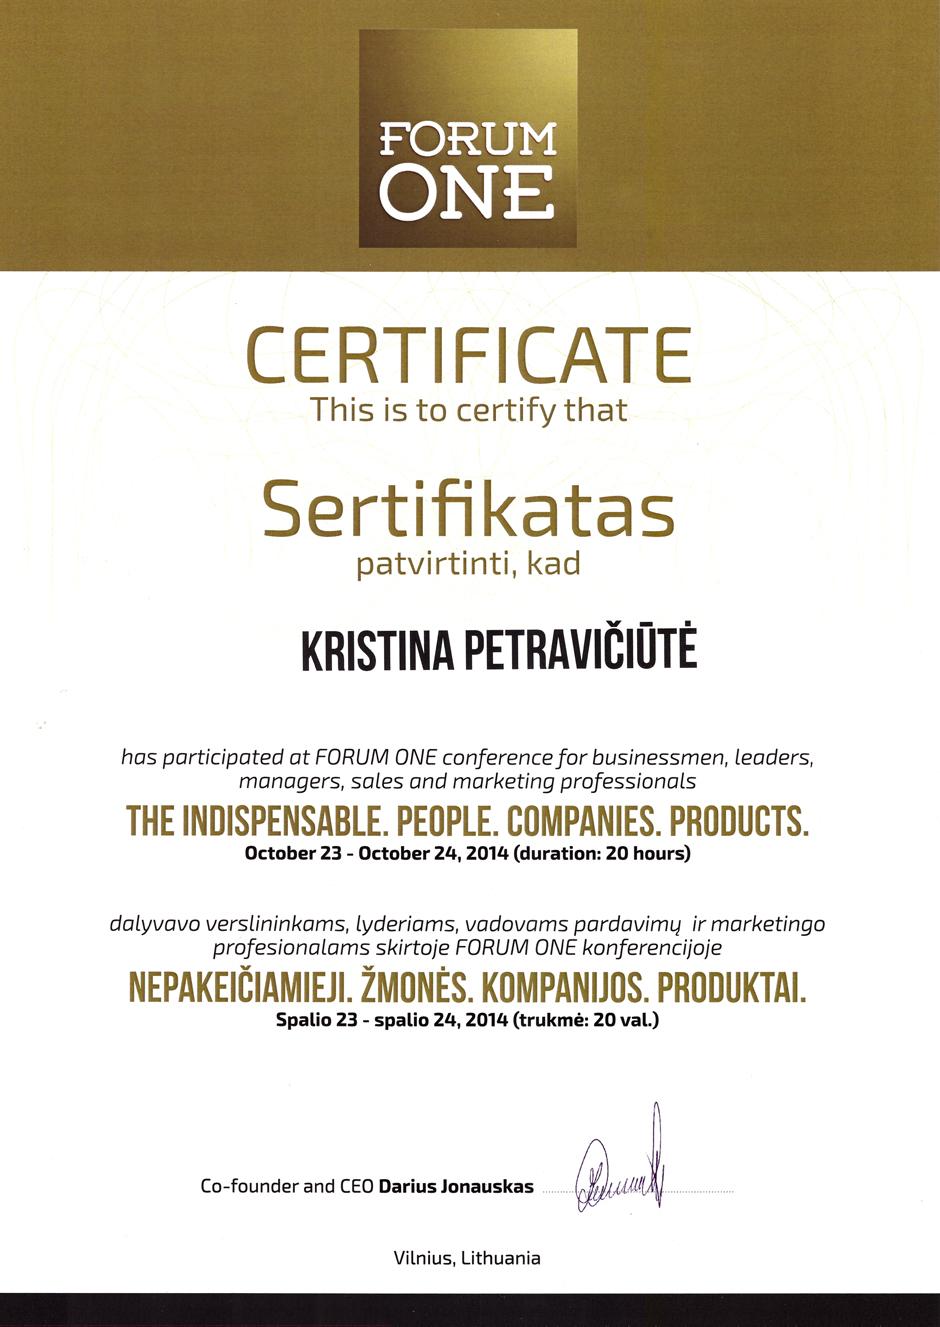 Kristina Petraviciute - Forum One certificate 2014